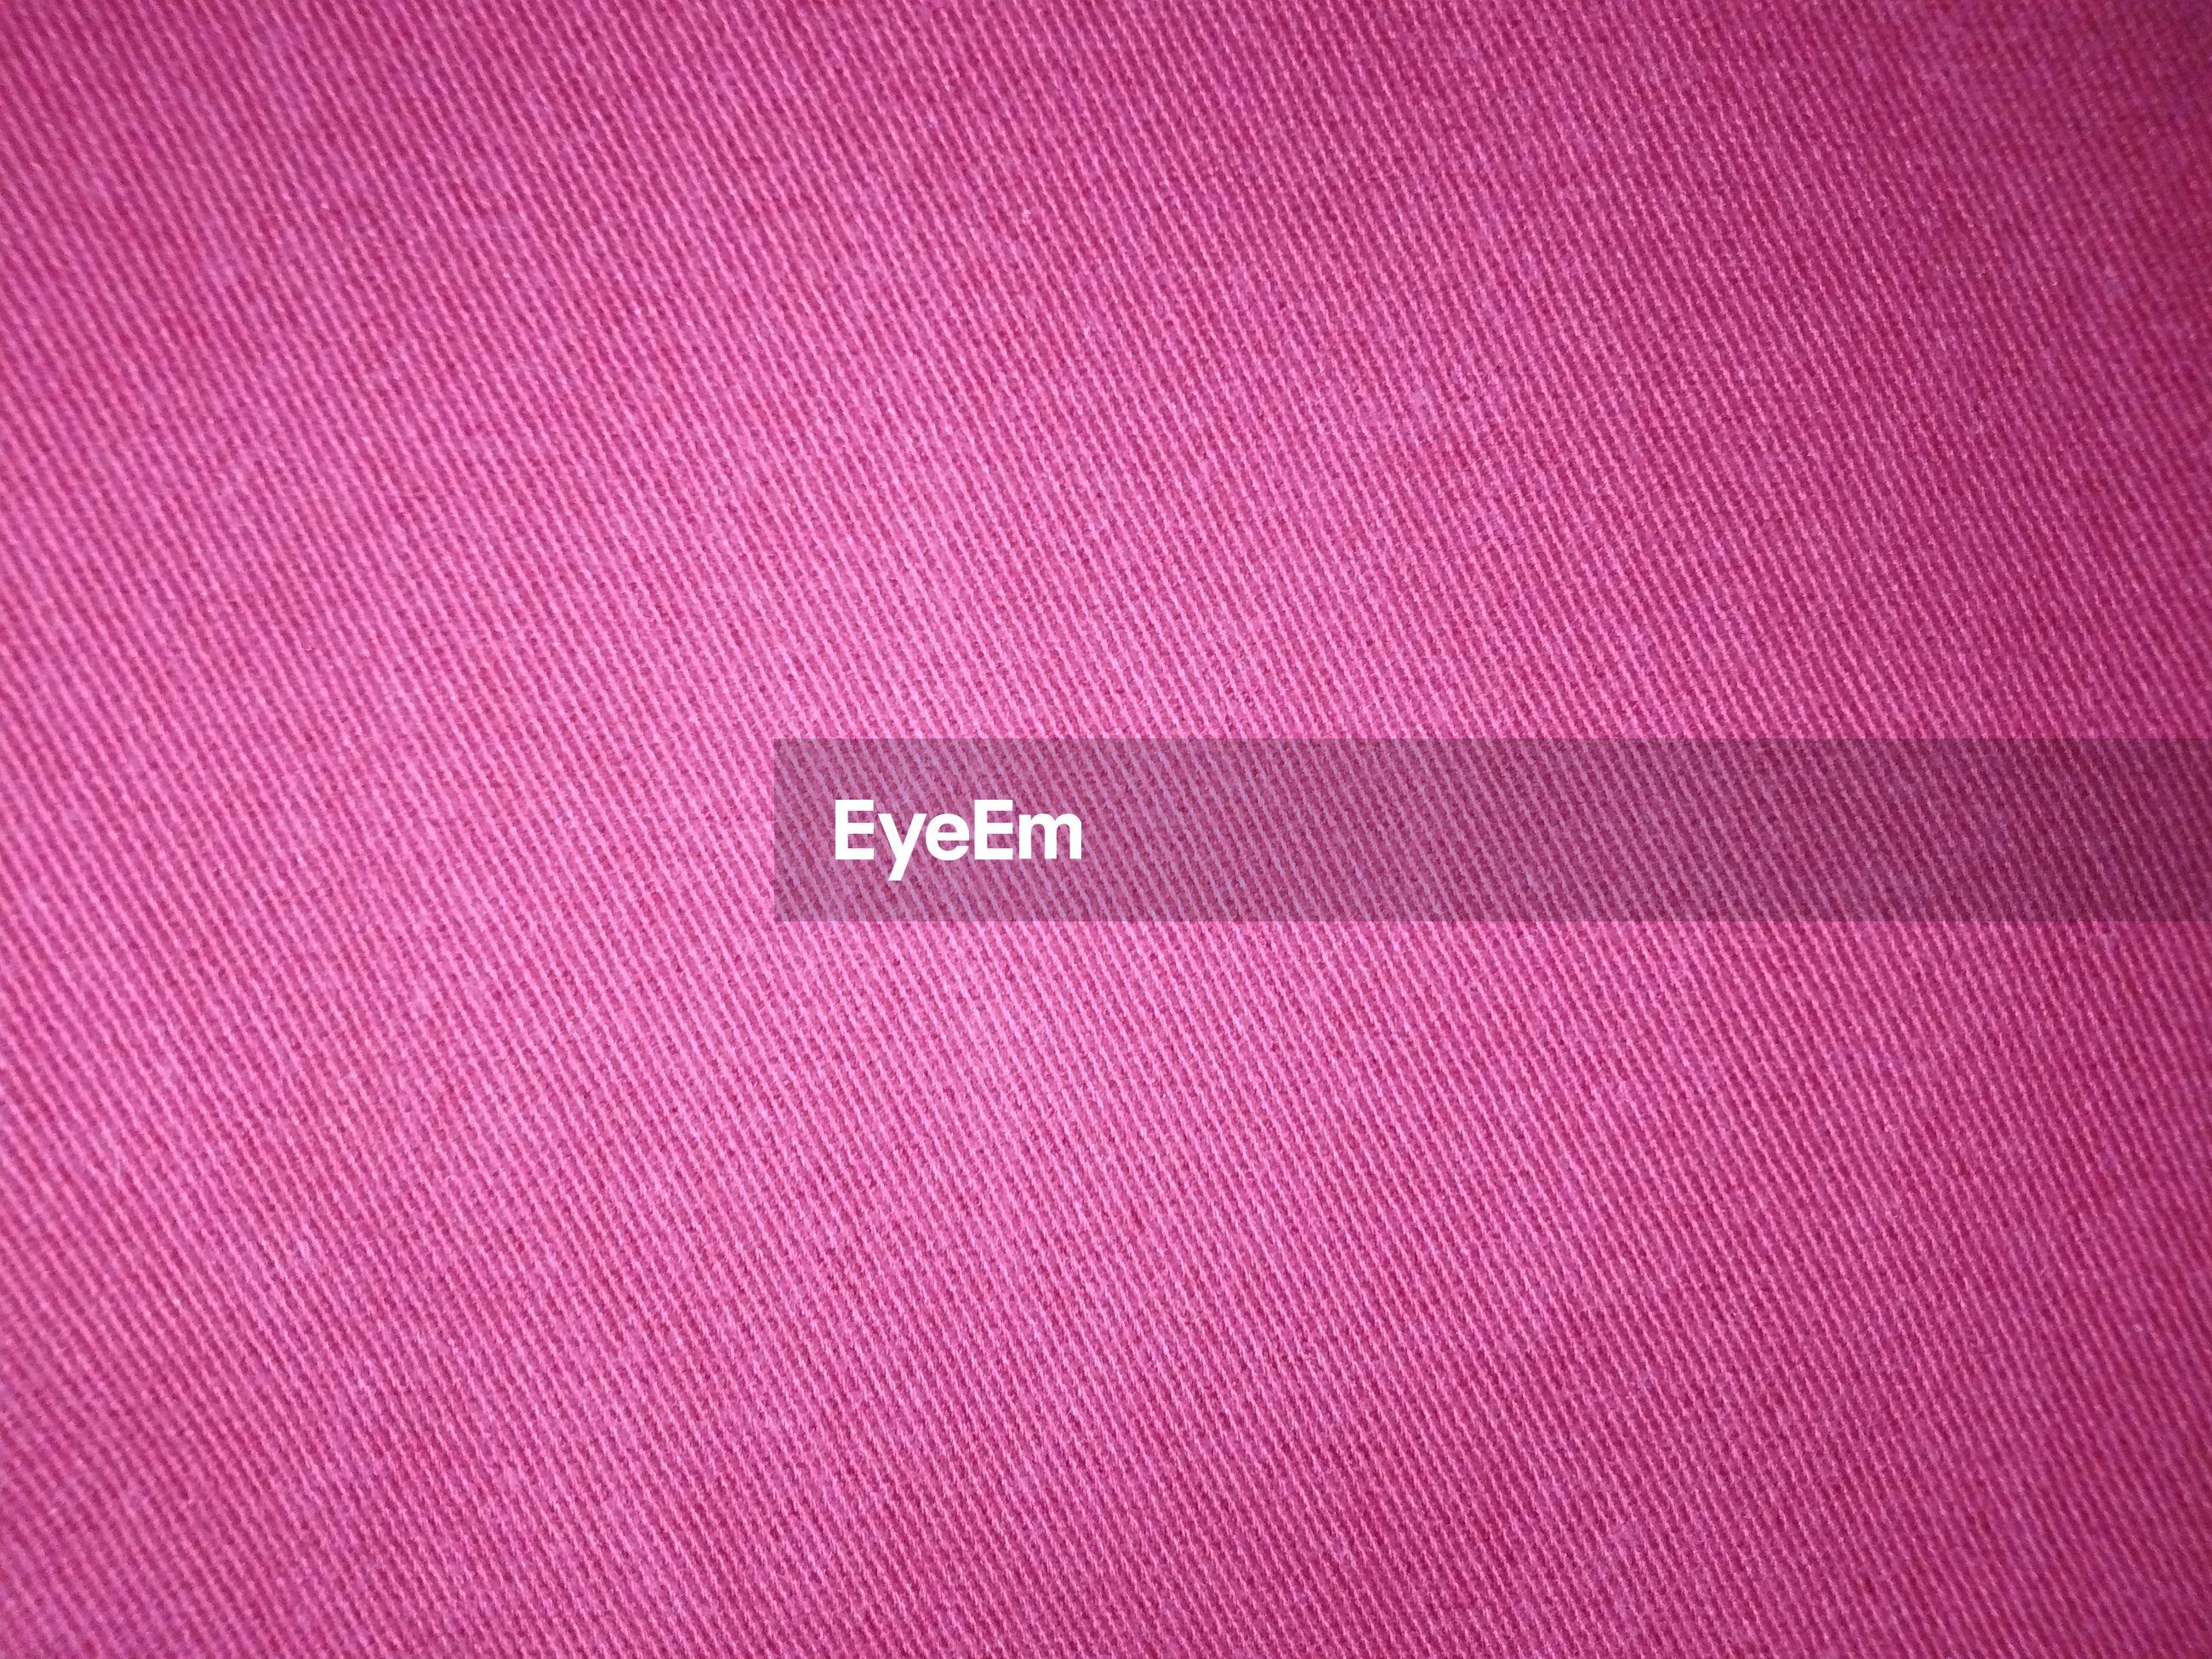 Full frame shot of pink fabric